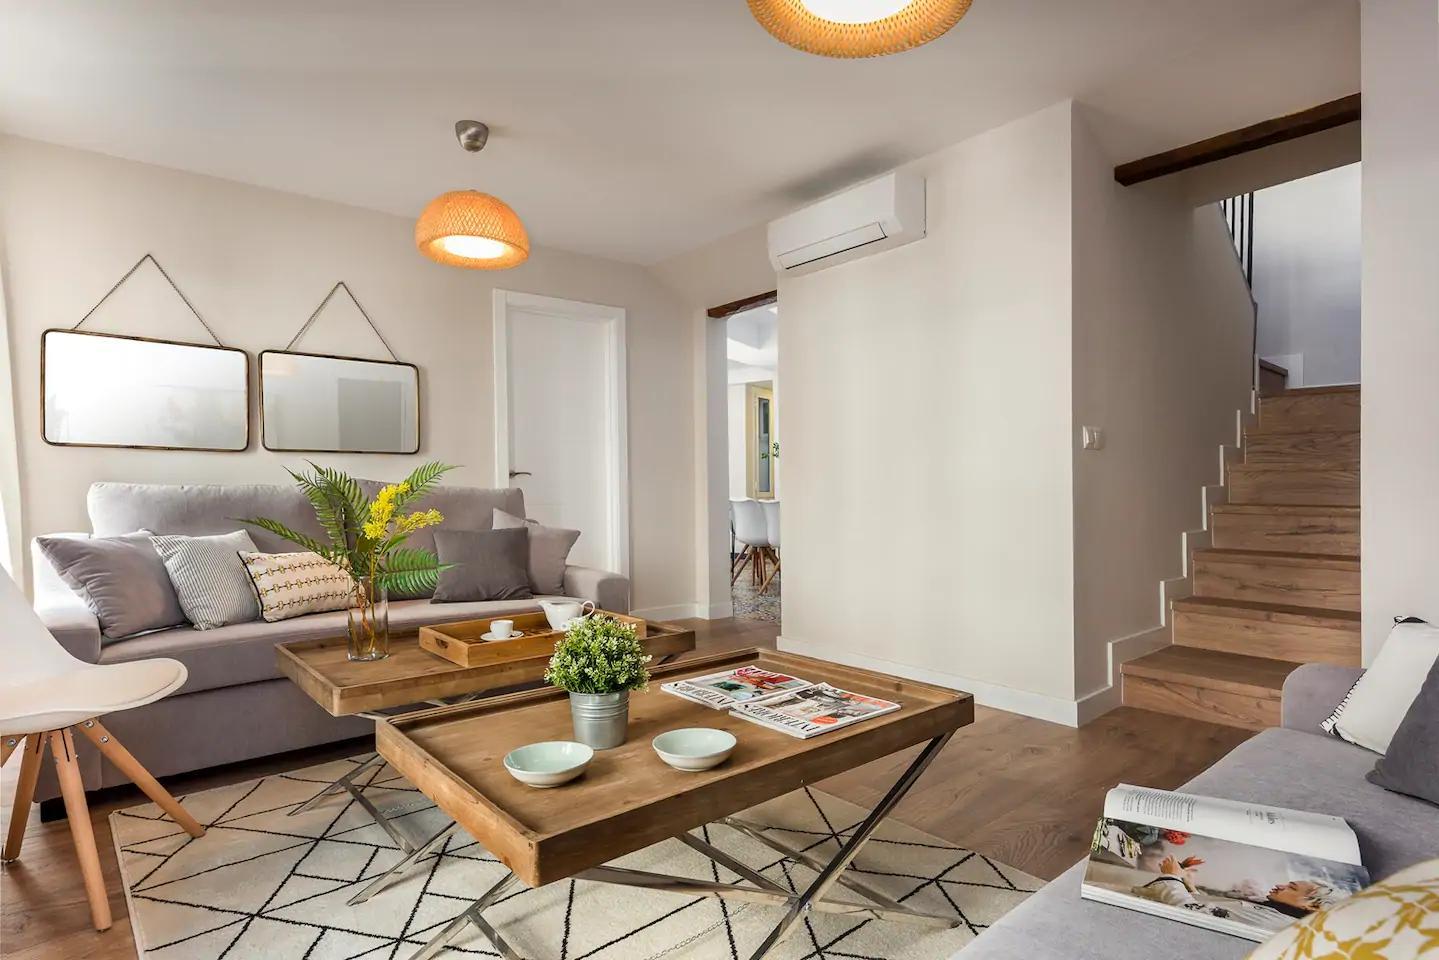 Caldereria - 3 bedroom flat in Malaga